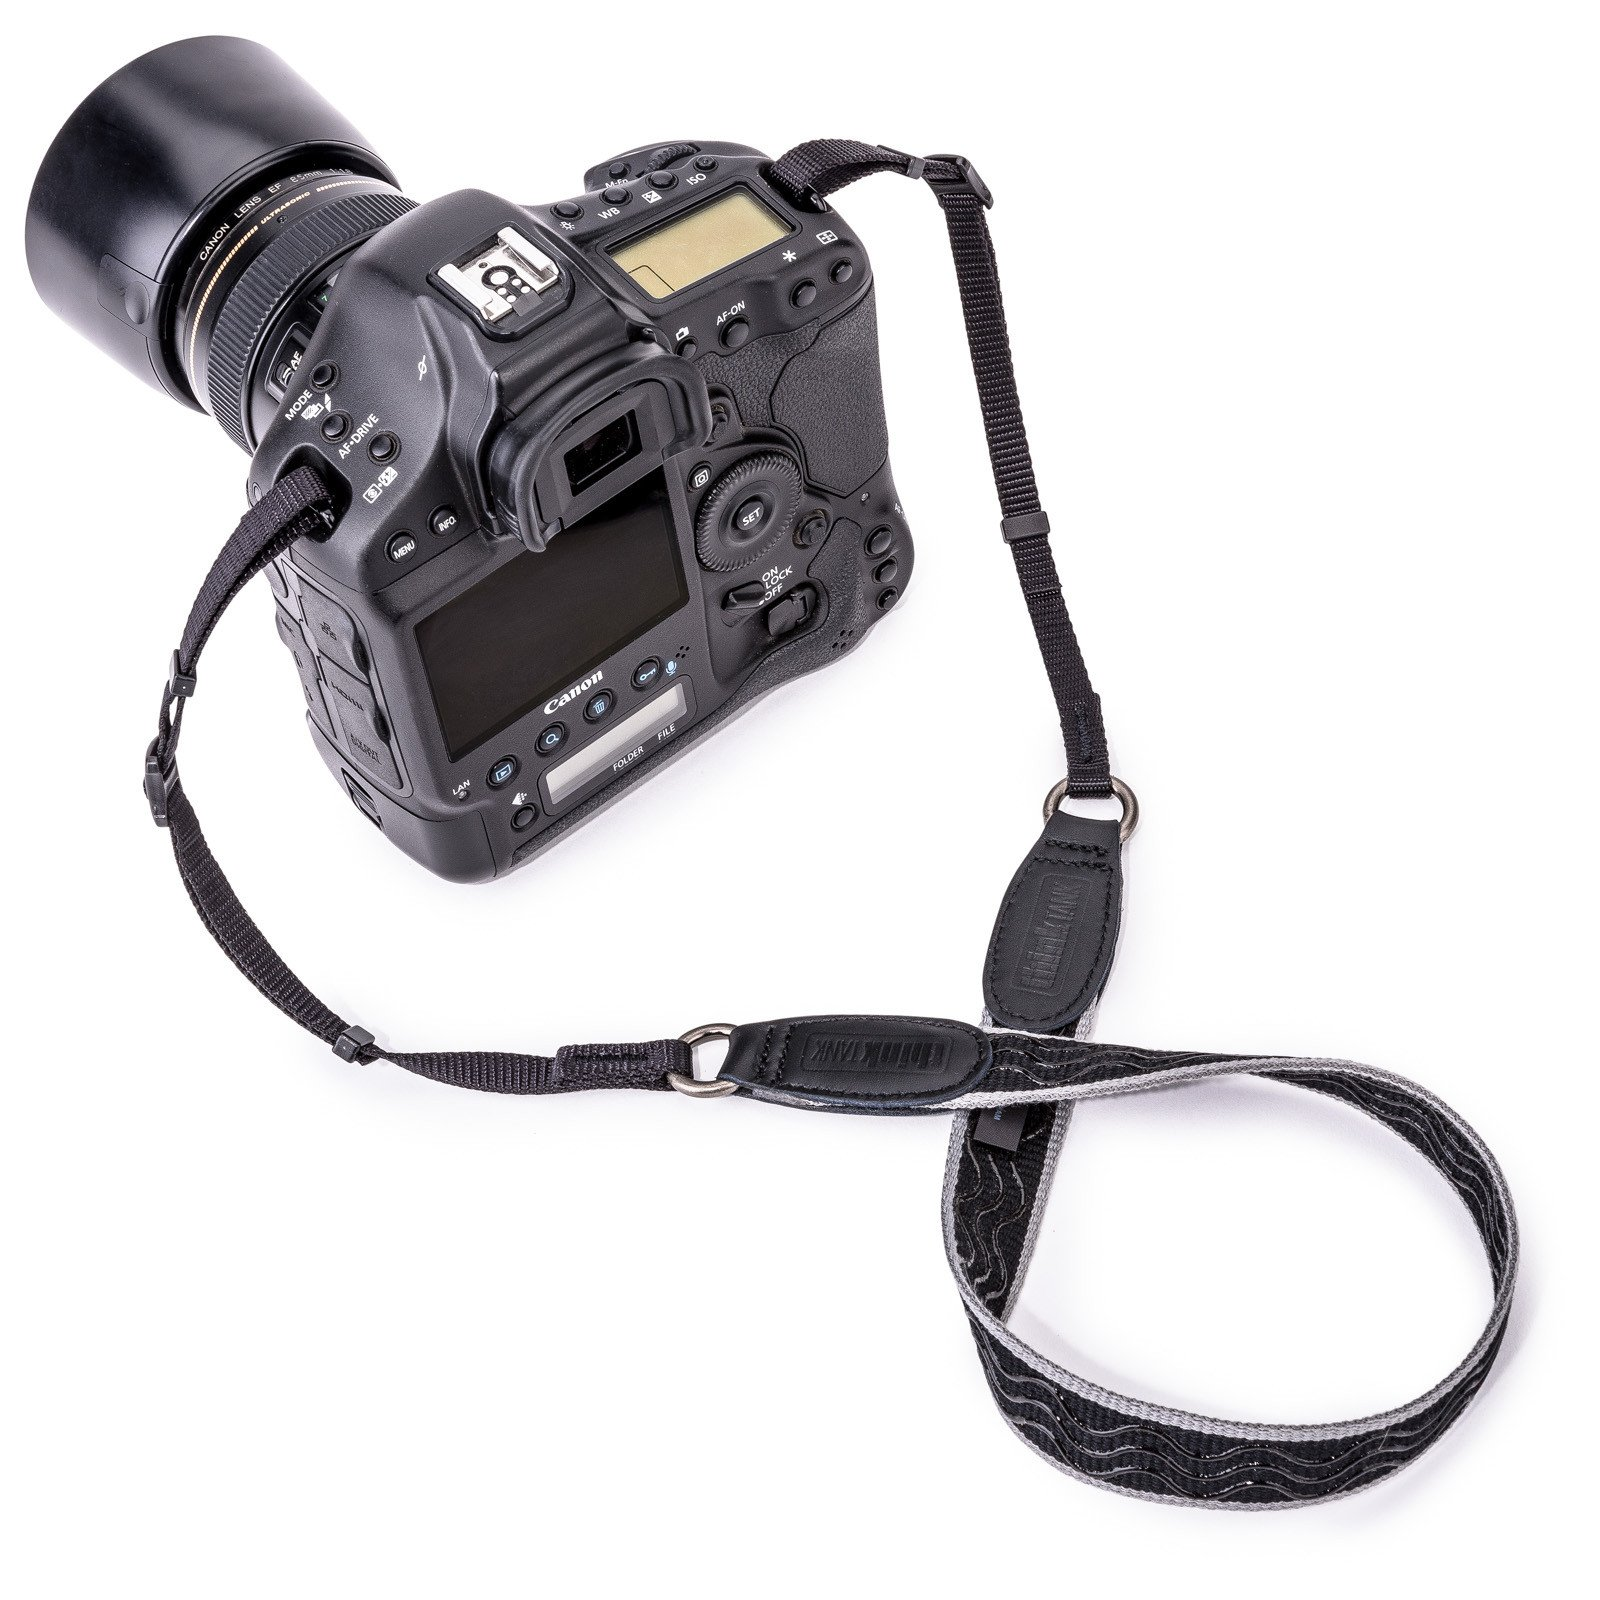 camera strp v2 gray 5 image